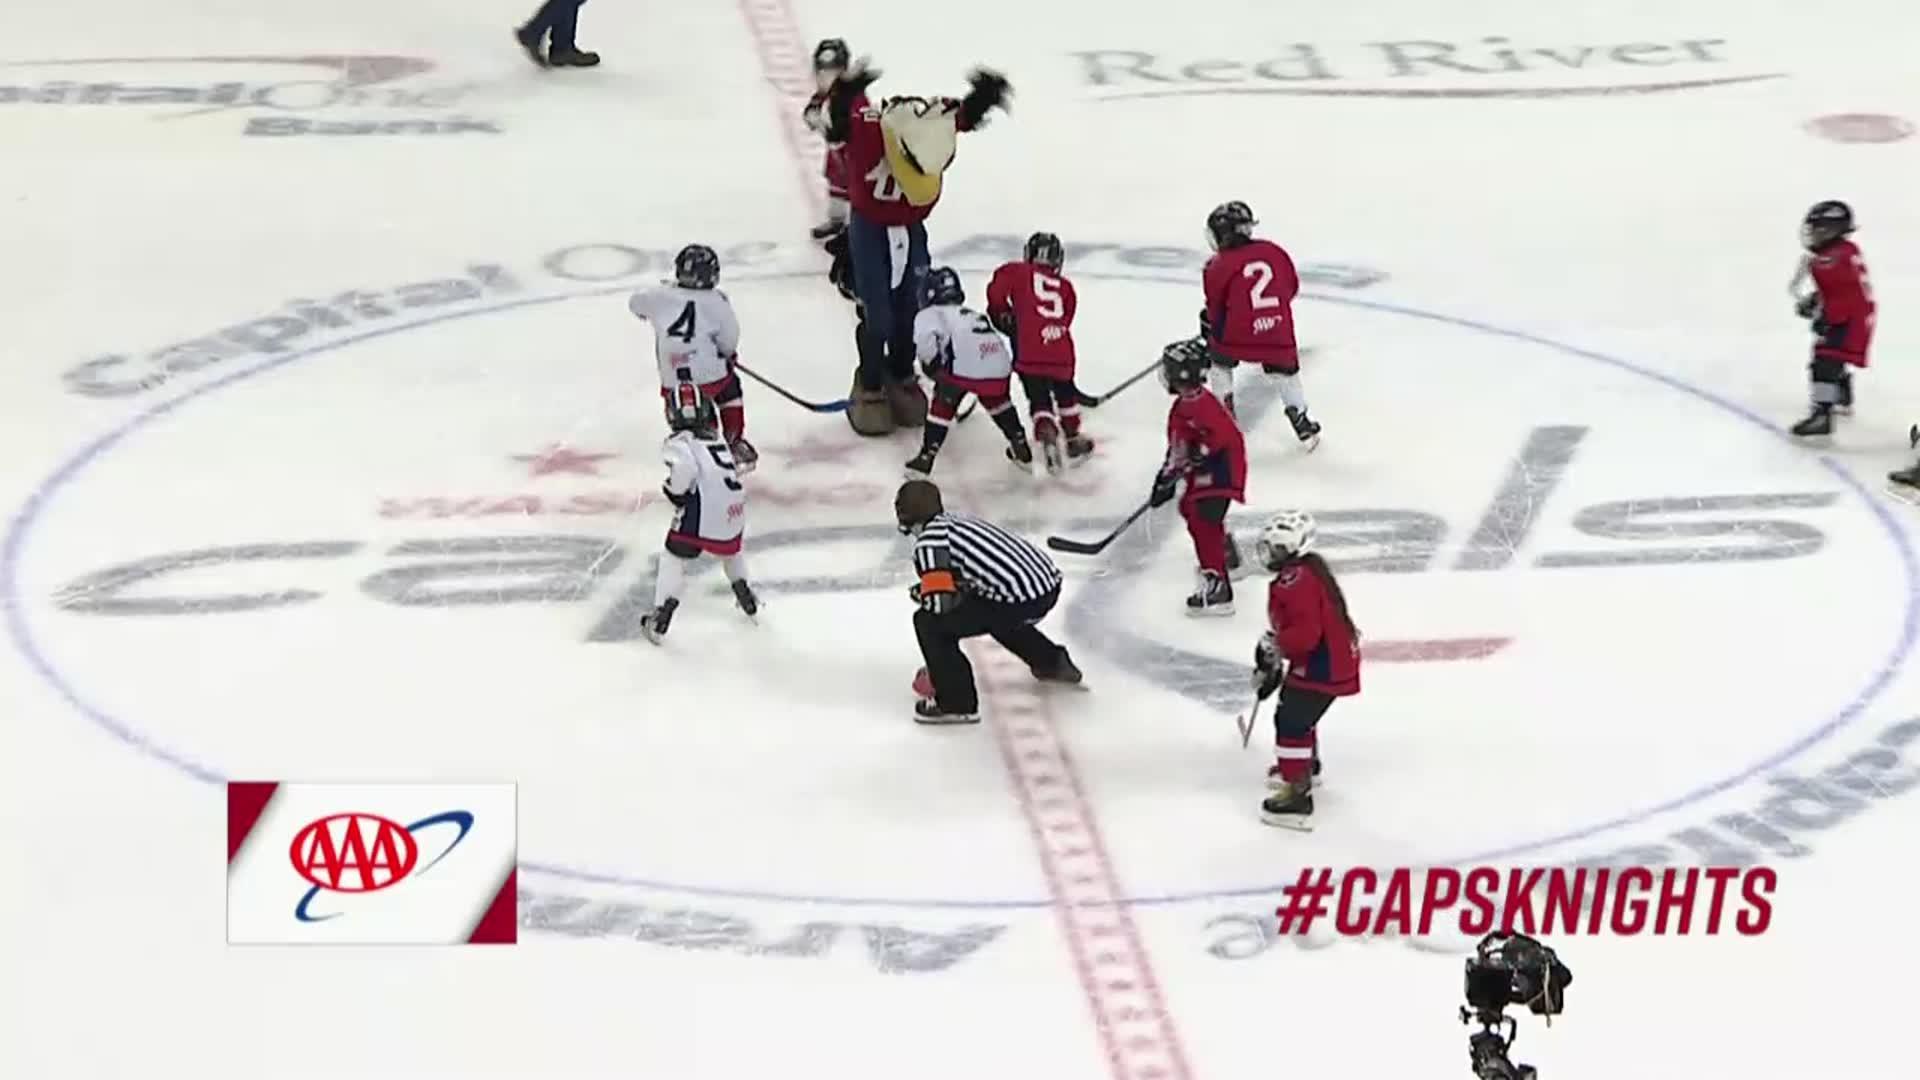 #CapsKnights Mites on Ice 2/4/18